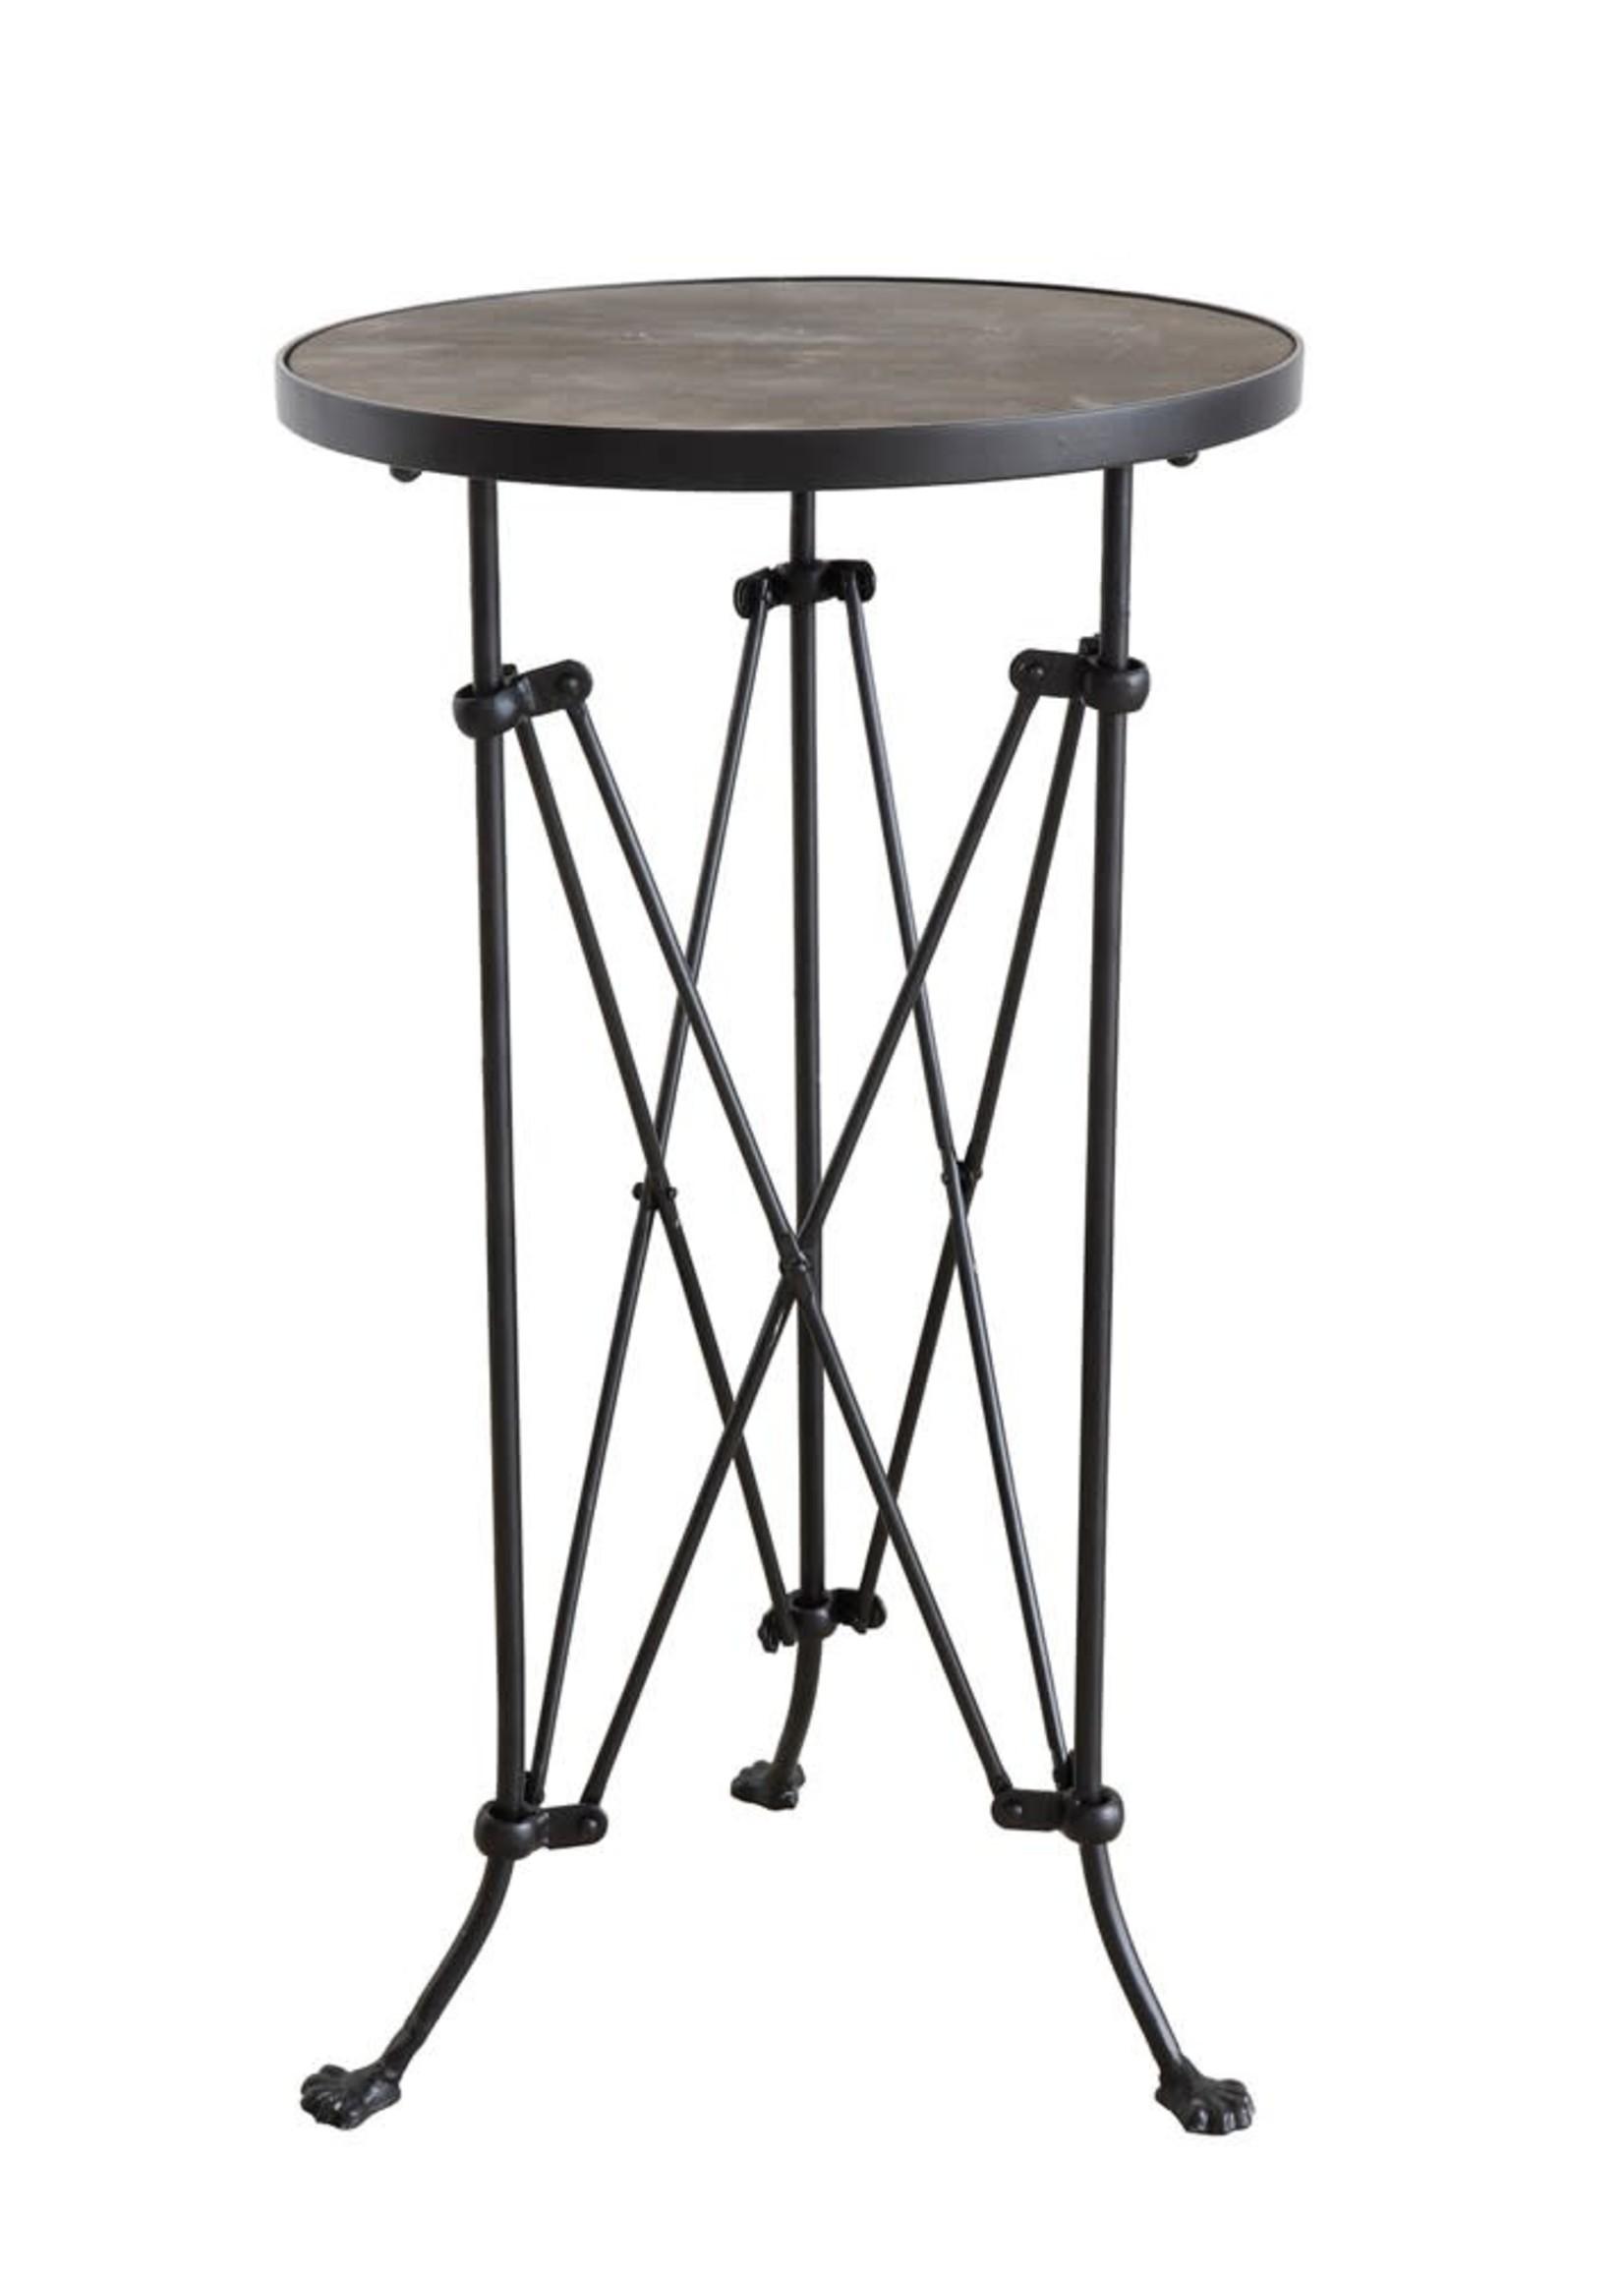 "15""L x 14""W x 25-1/4""H Metal Table w/ Wood Top"